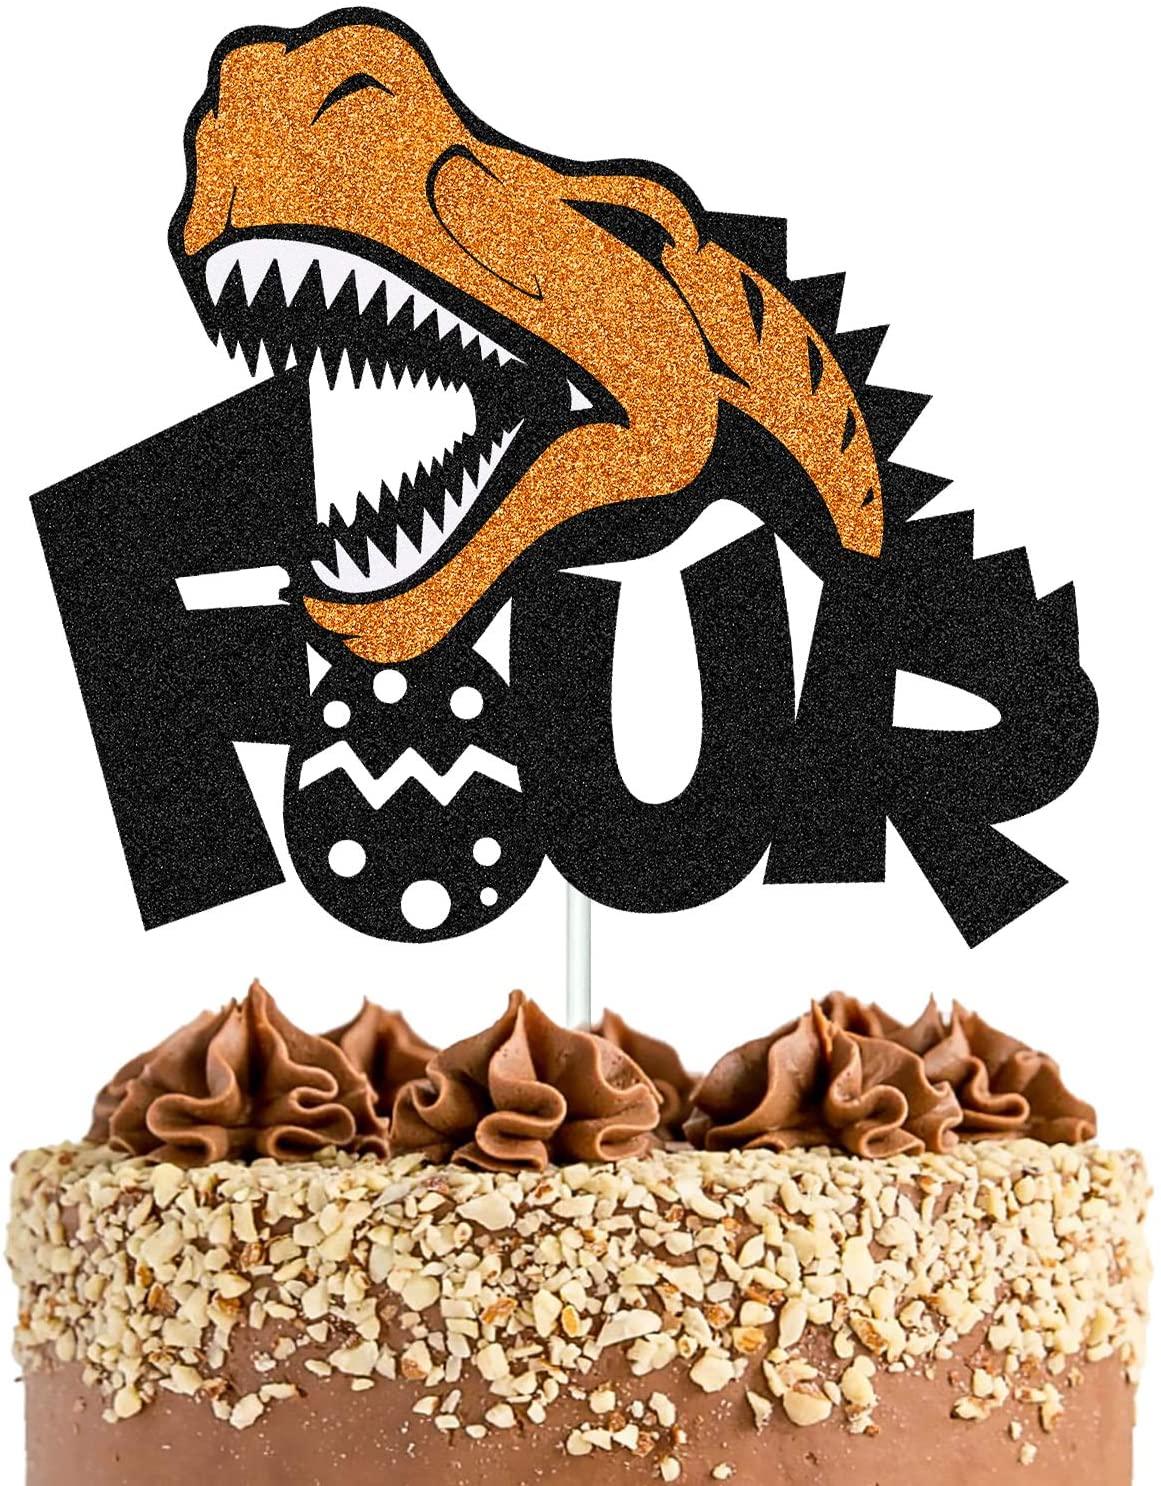 Dinosaur Four Cake Topper Happy Birthday Cake Decorations for Kids Boys Girls Dino Dinosaur Jungle Themed 4th Birthday Party Supplies Glitter Black Decor